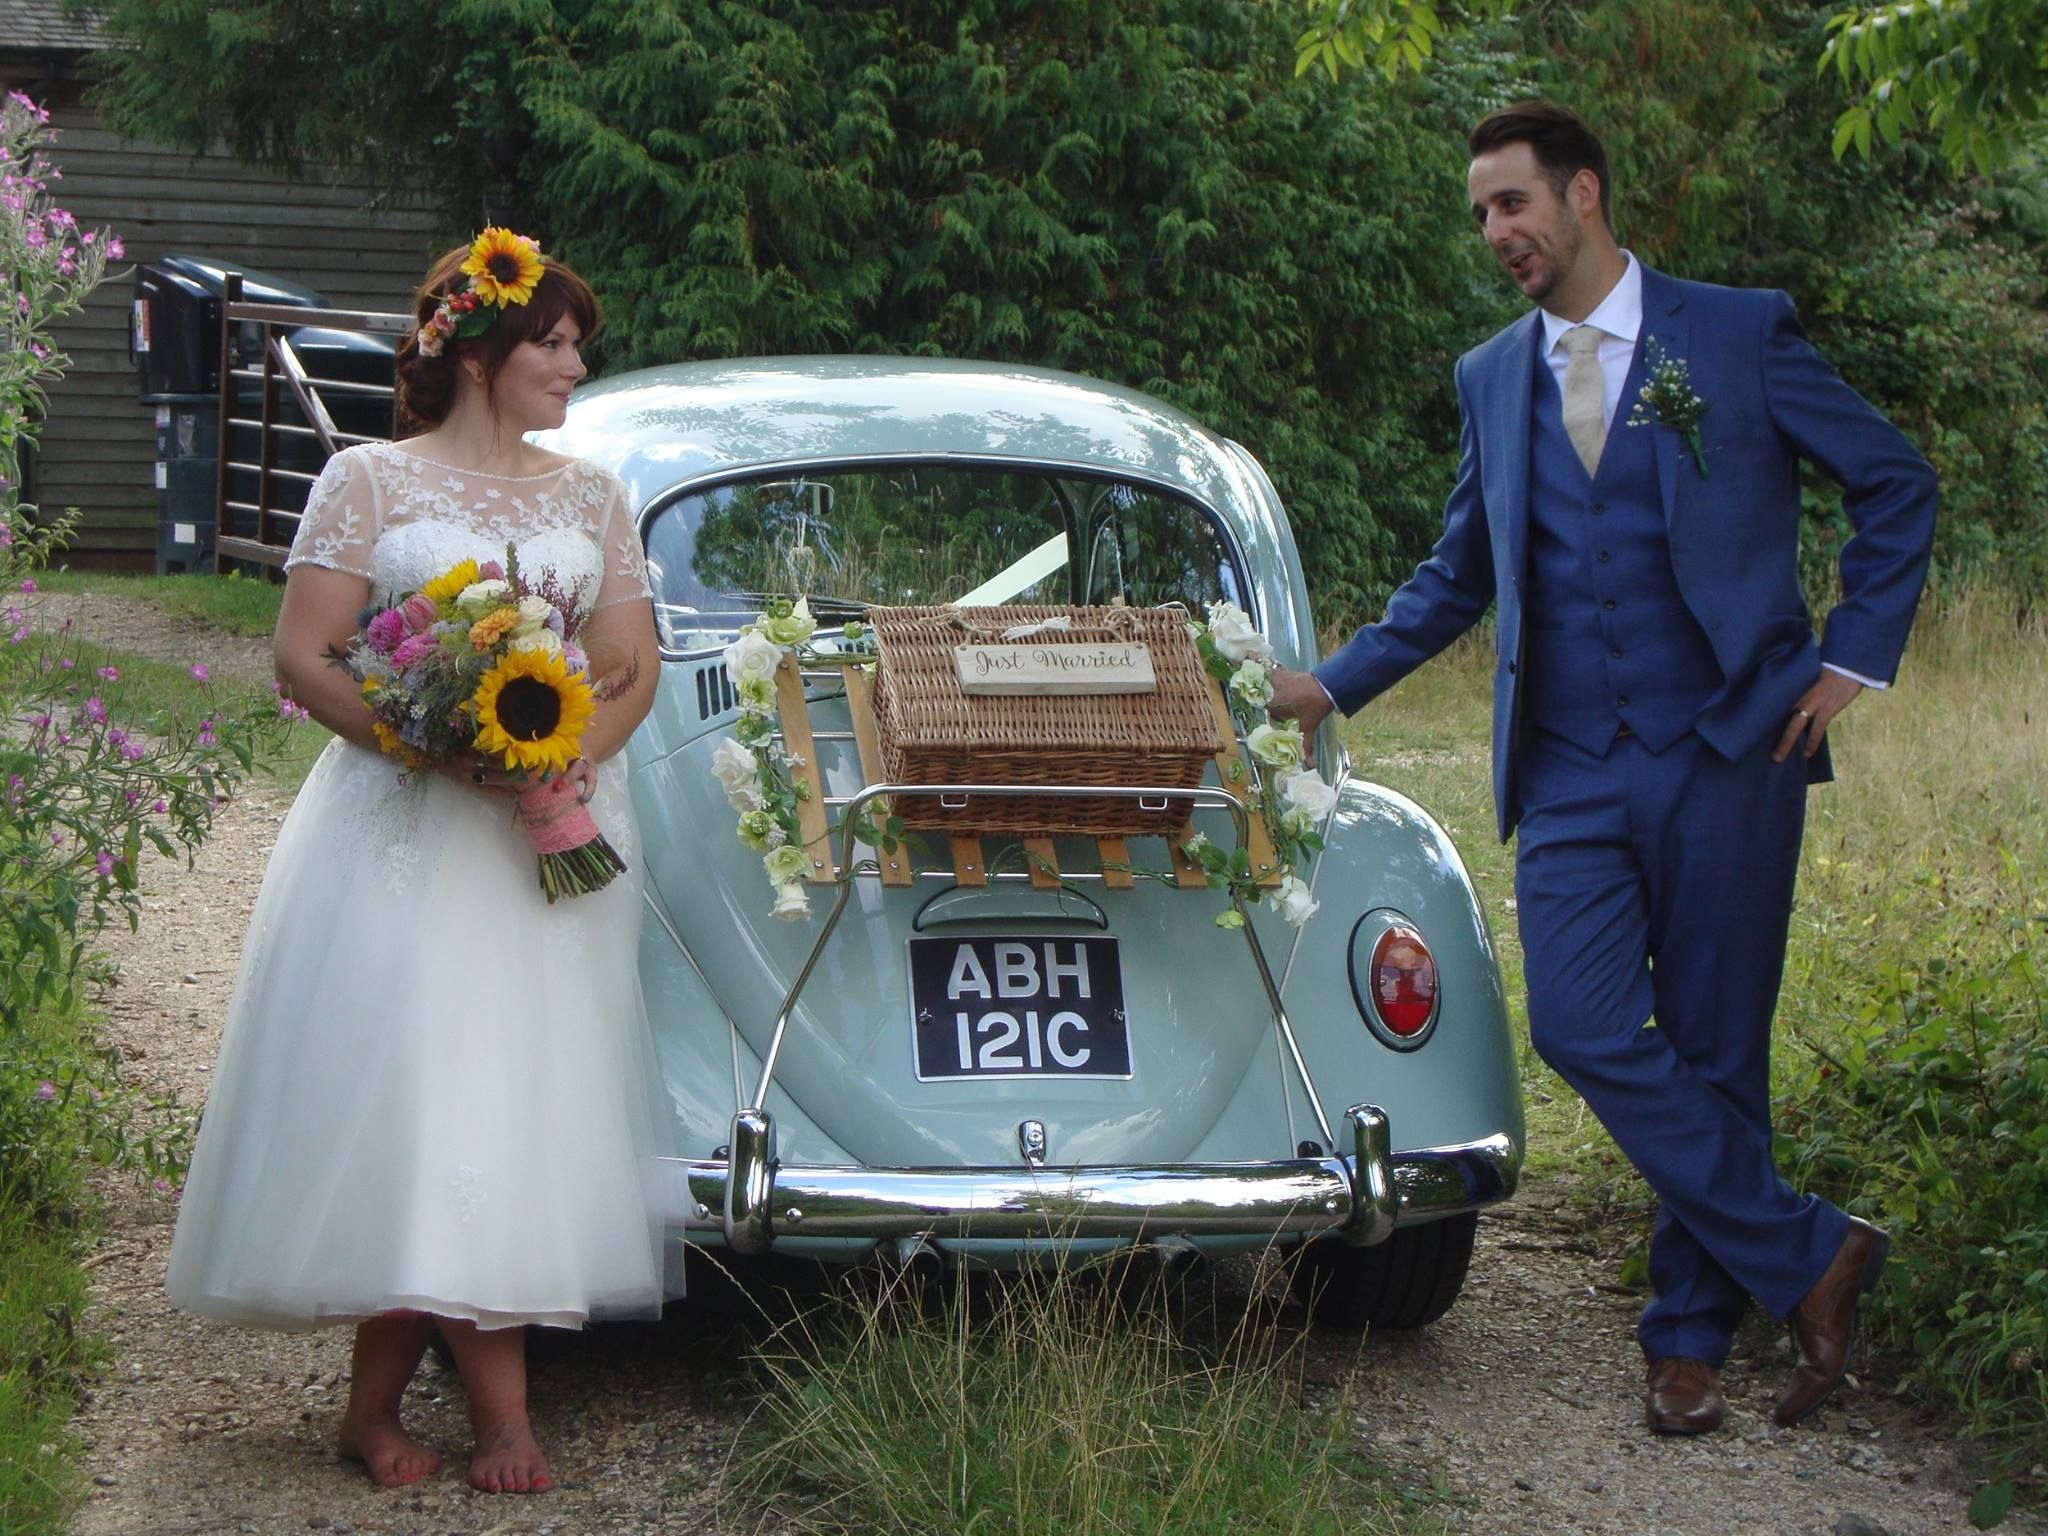 VW Beetle wedding transport